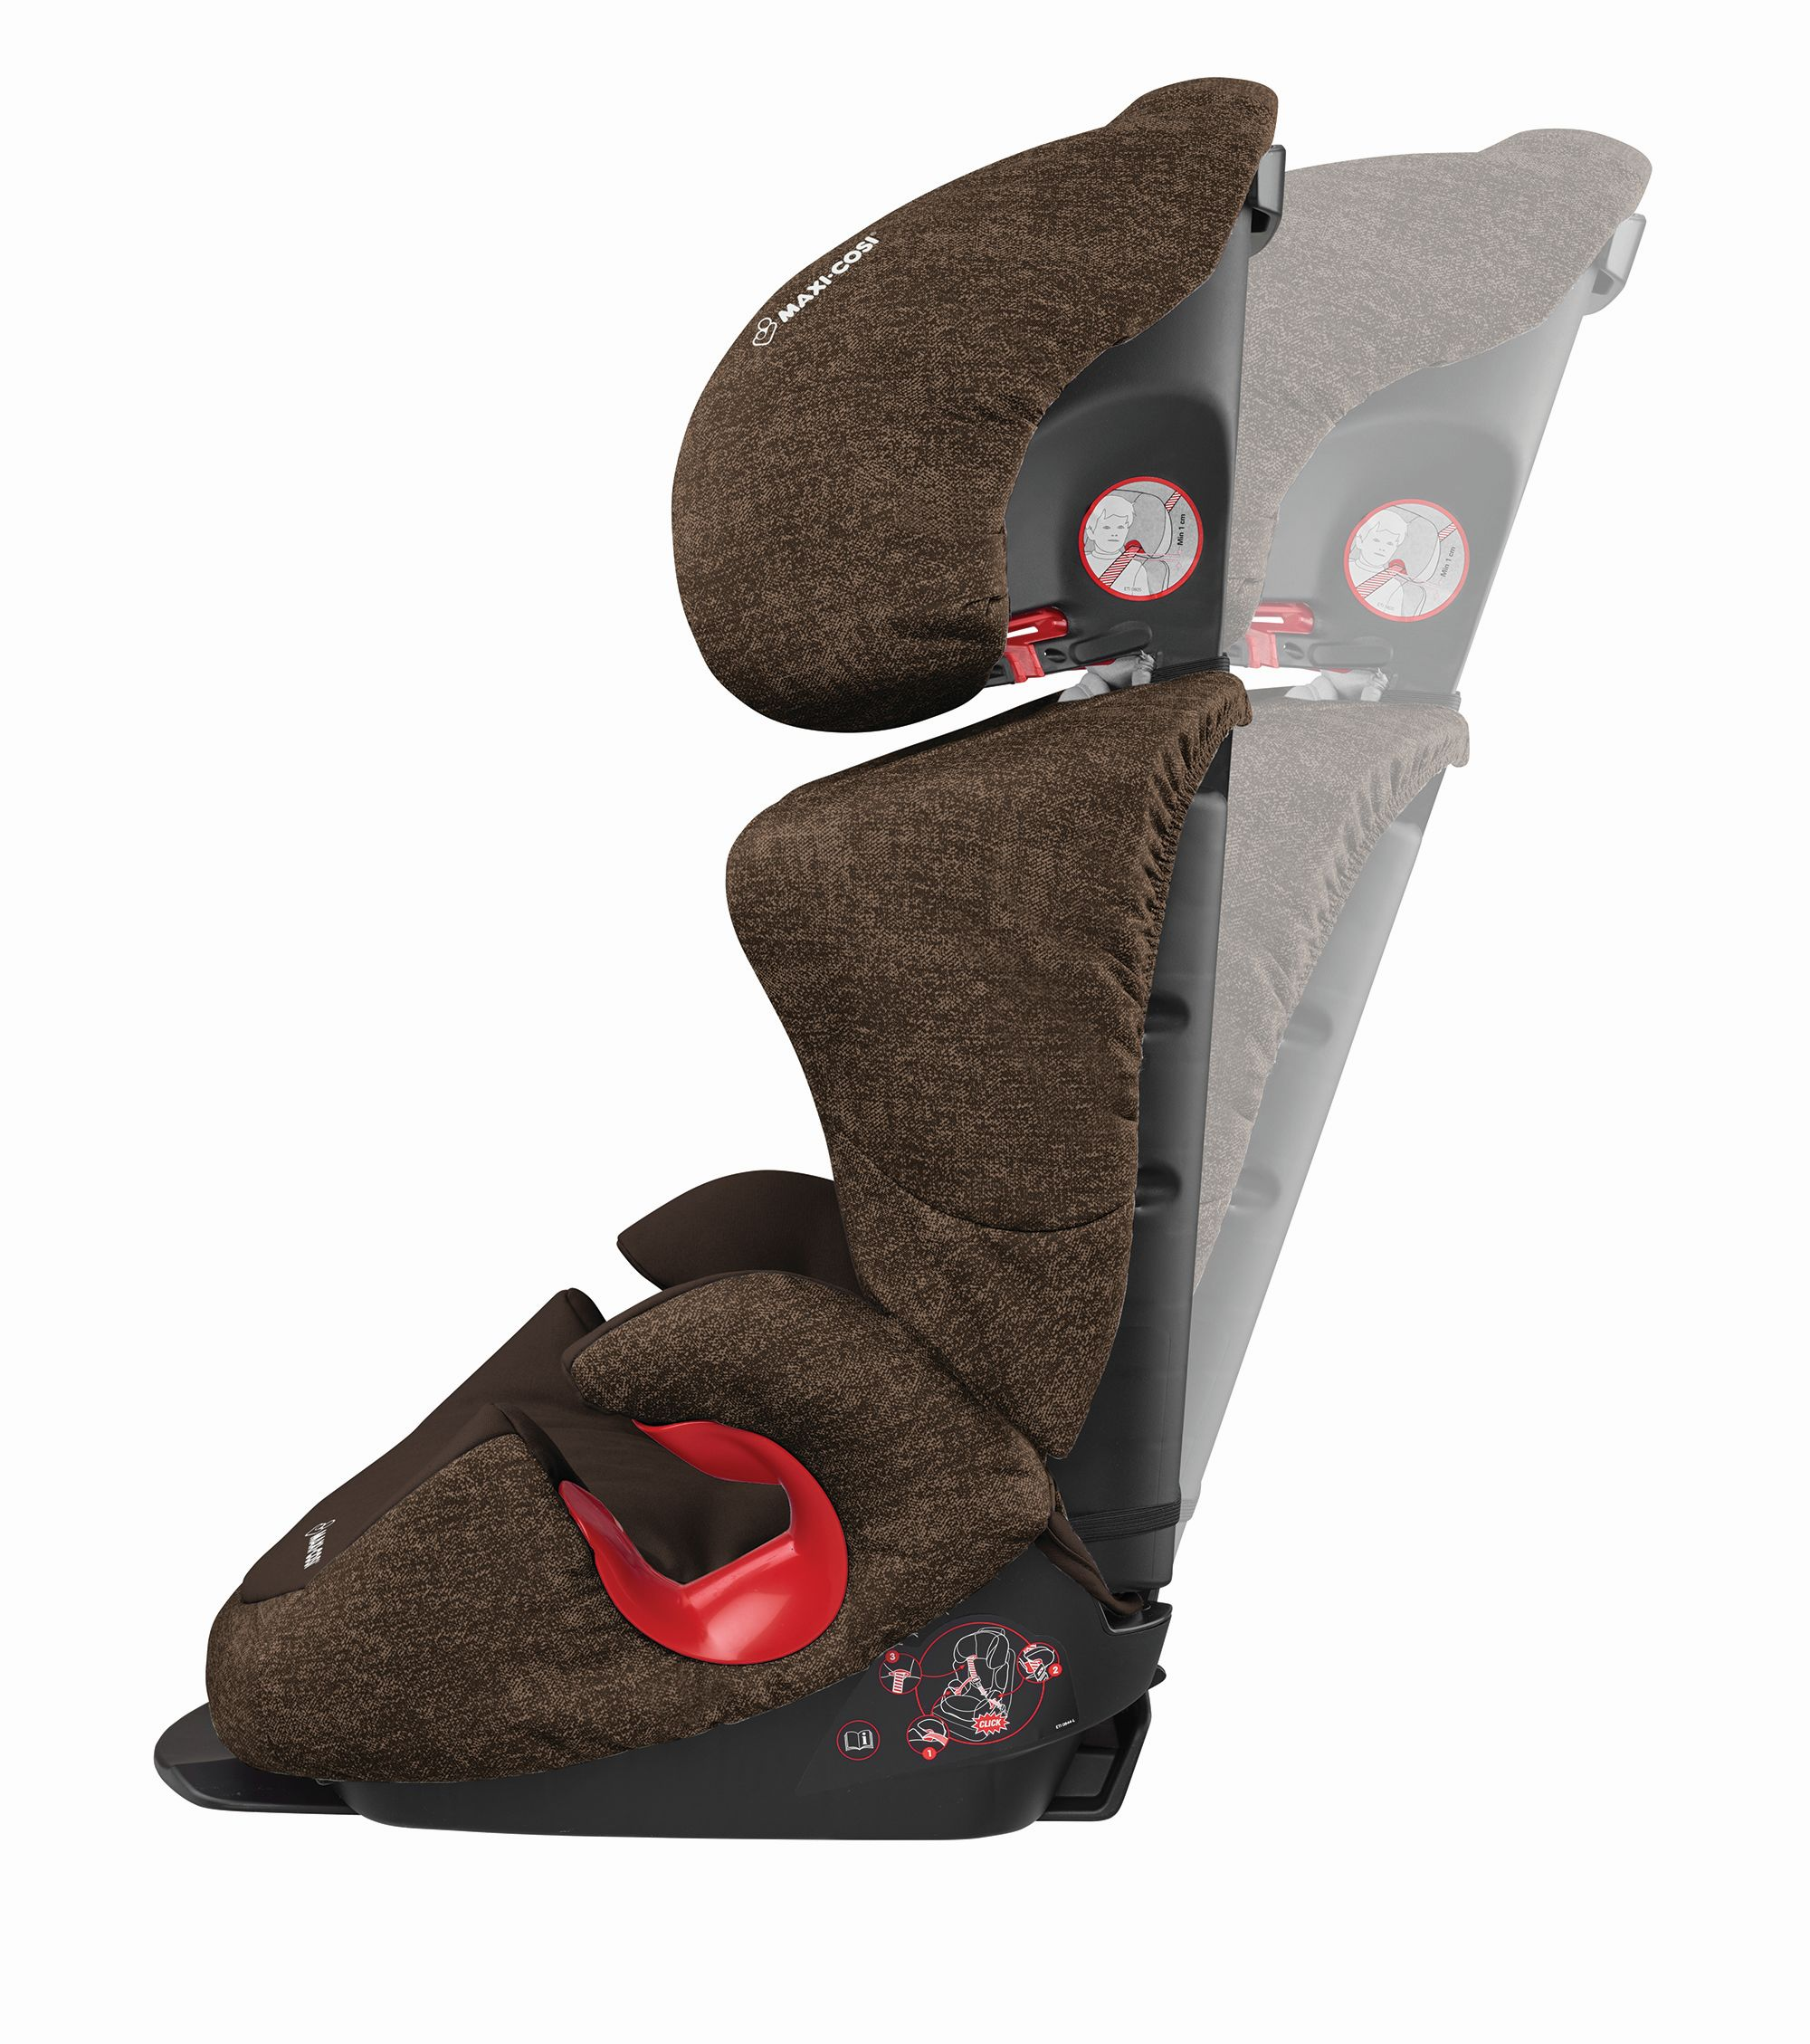 maxi cosi child car seat rodi air protect 2018 nomad brown. Black Bedroom Furniture Sets. Home Design Ideas